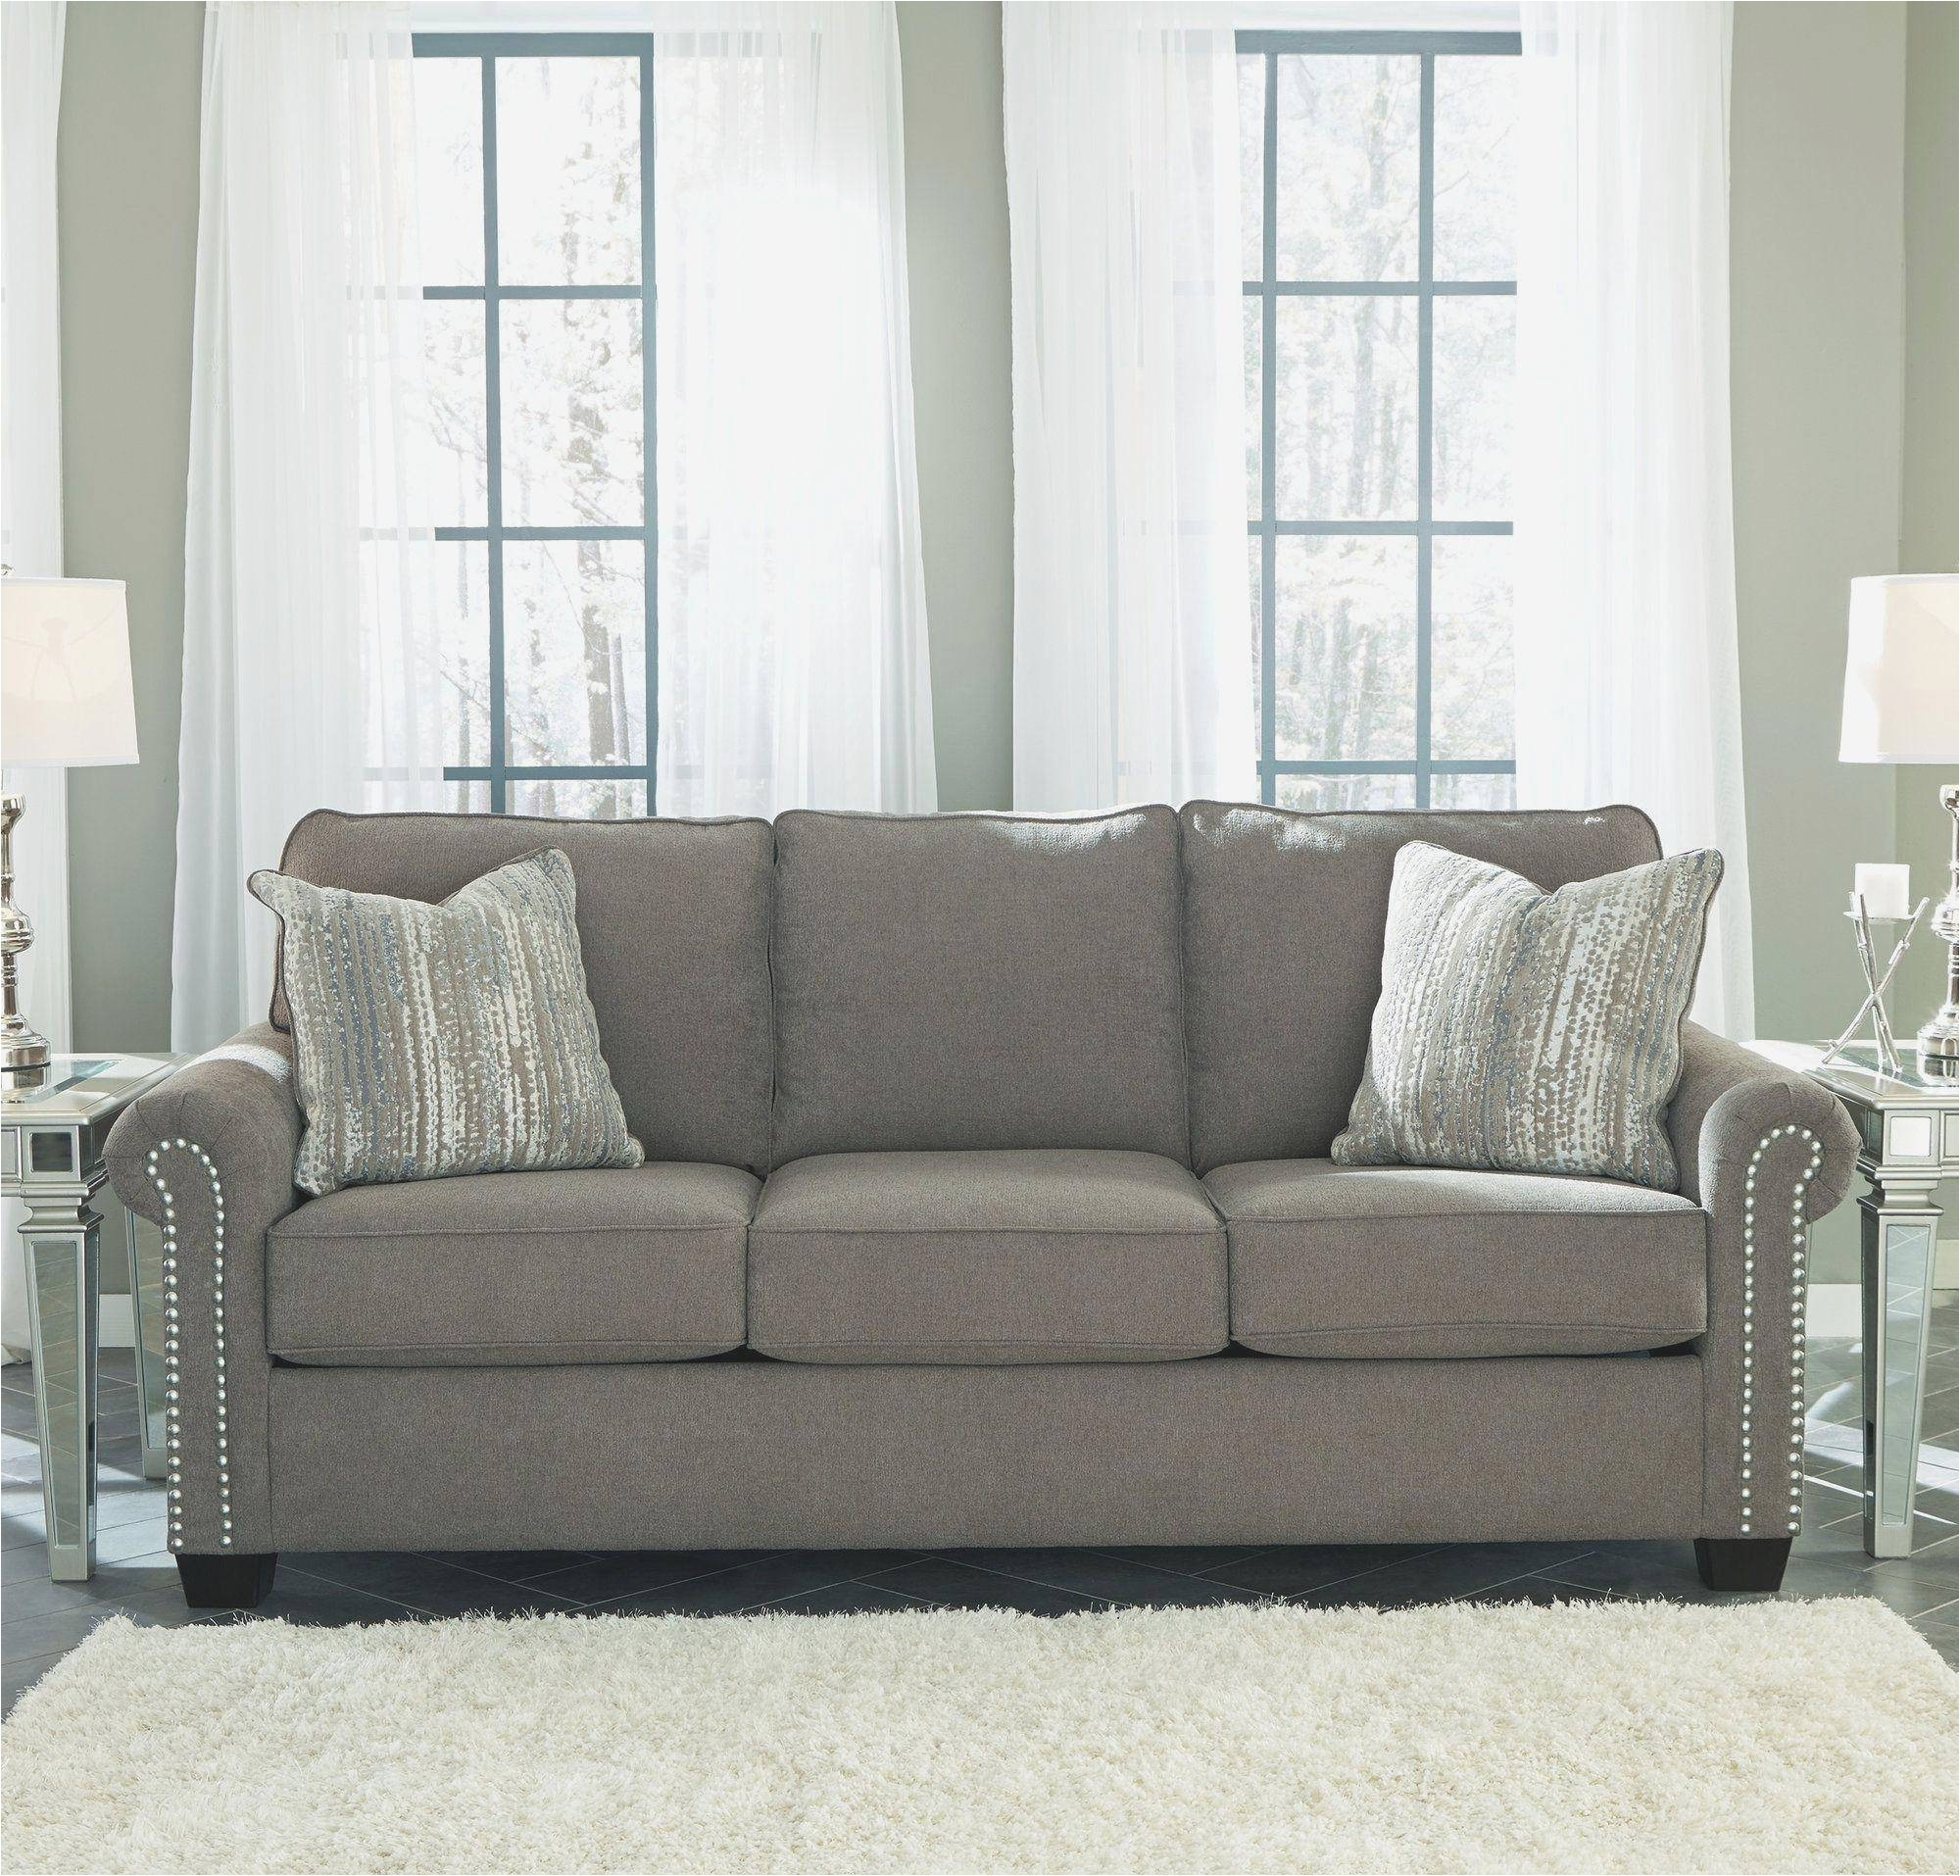 Bedcock Furniture Store 27 Best Of Badcock Home Furniture Photos Home Furniture Ideas